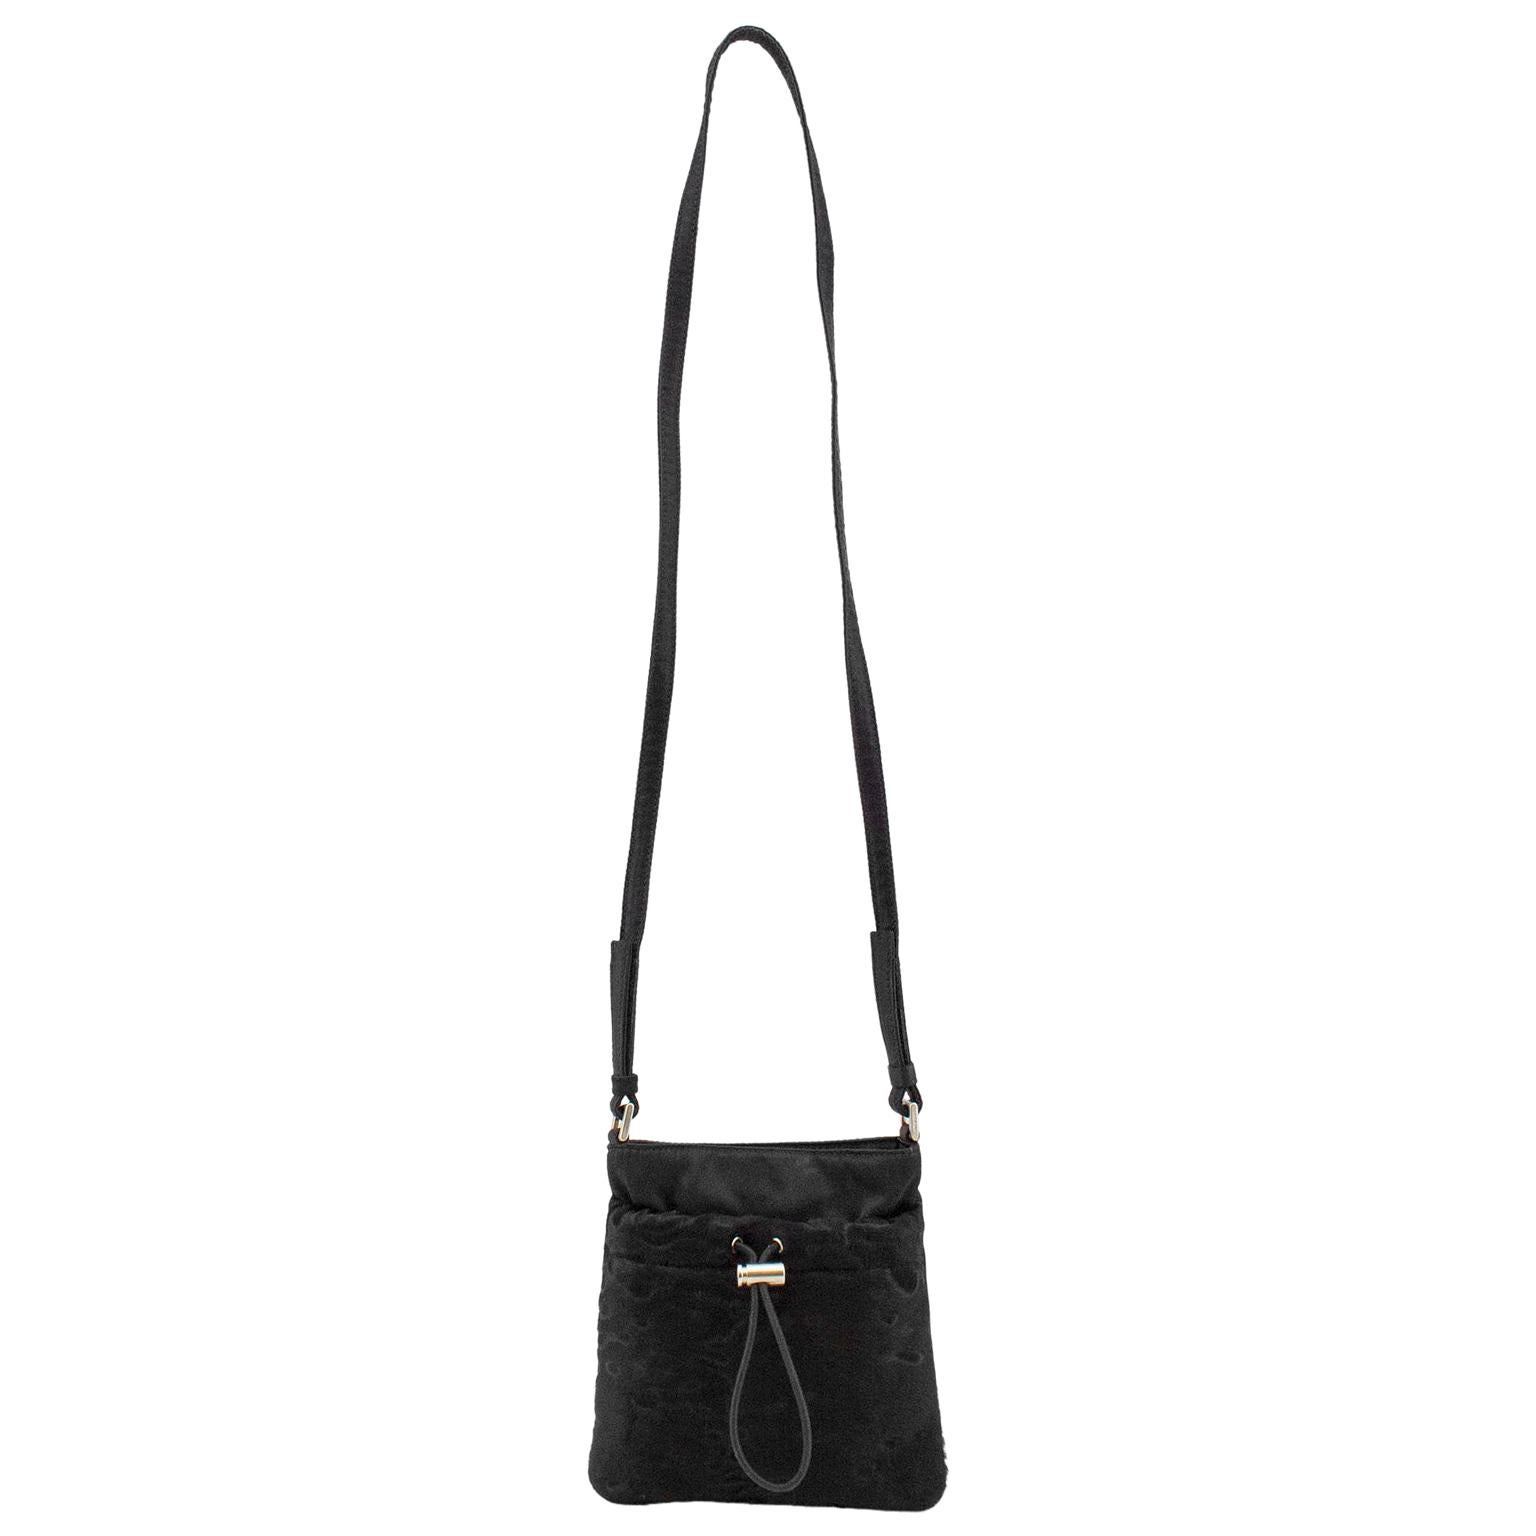 1990s Prada Black Satin and Pony Hair Mini Crossbody Bag